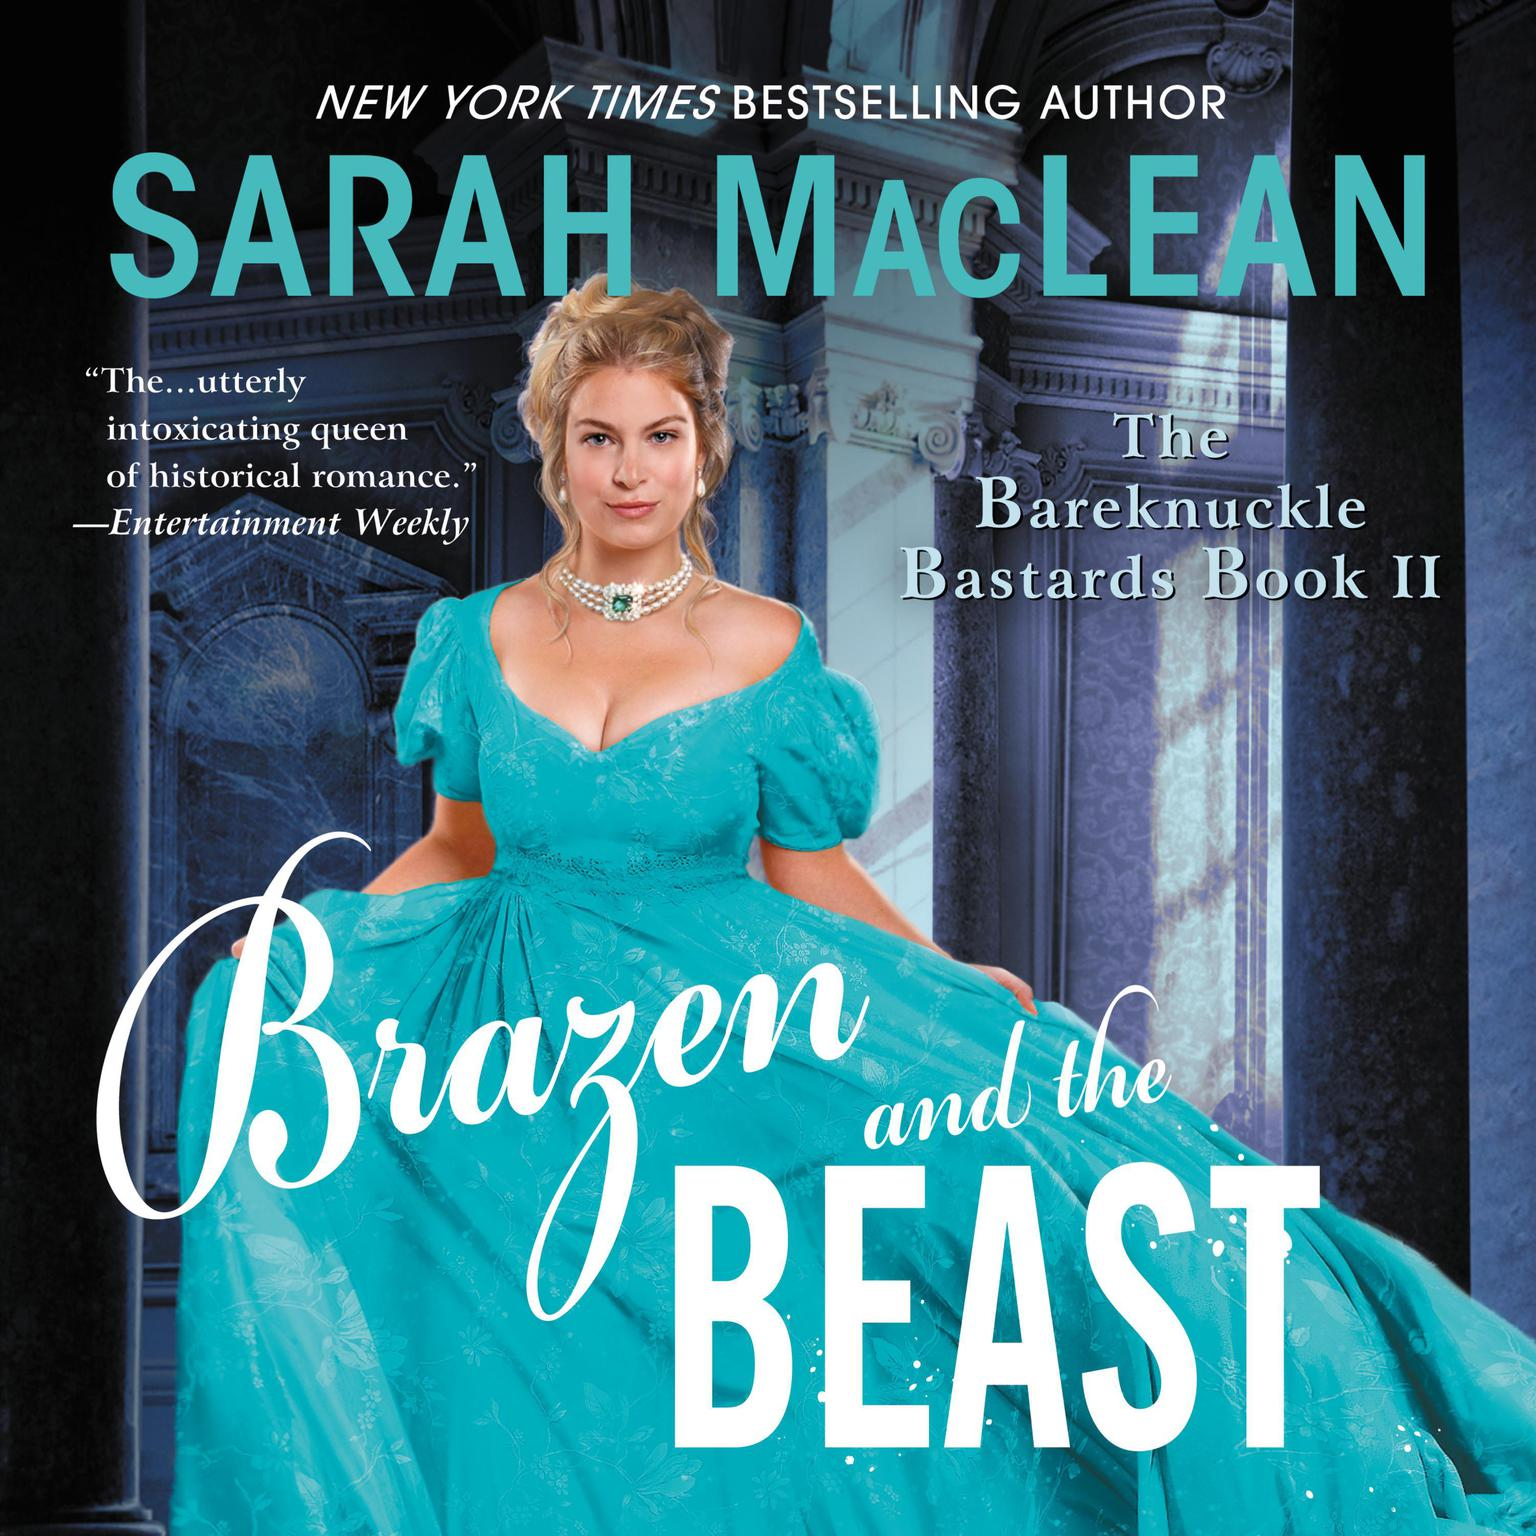 Printable Brazen and the Beast: The Bareknuckle Bastards Book II Audiobook Cover Art